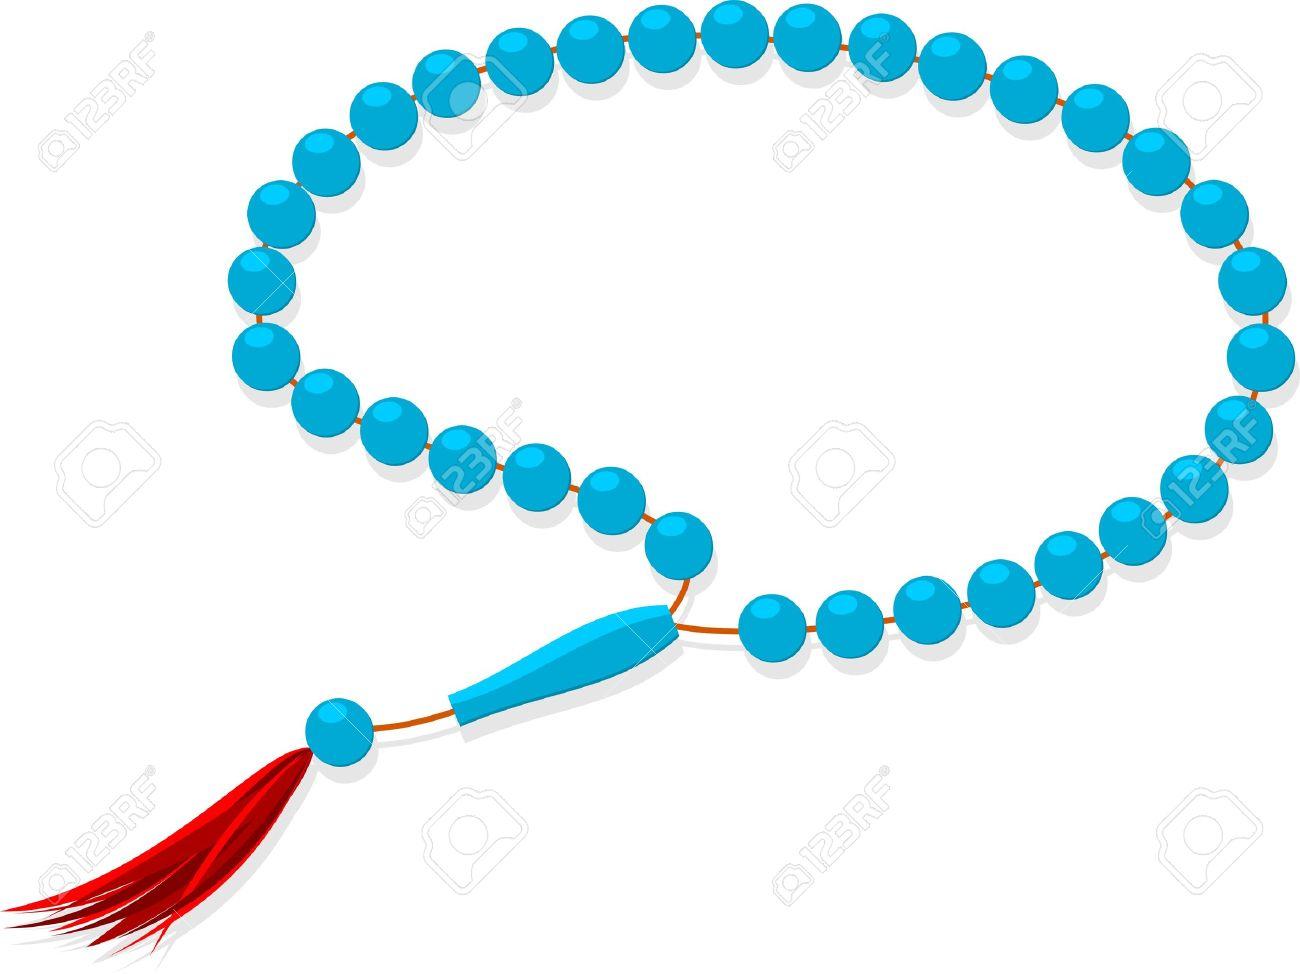 Muslim prayer beads.